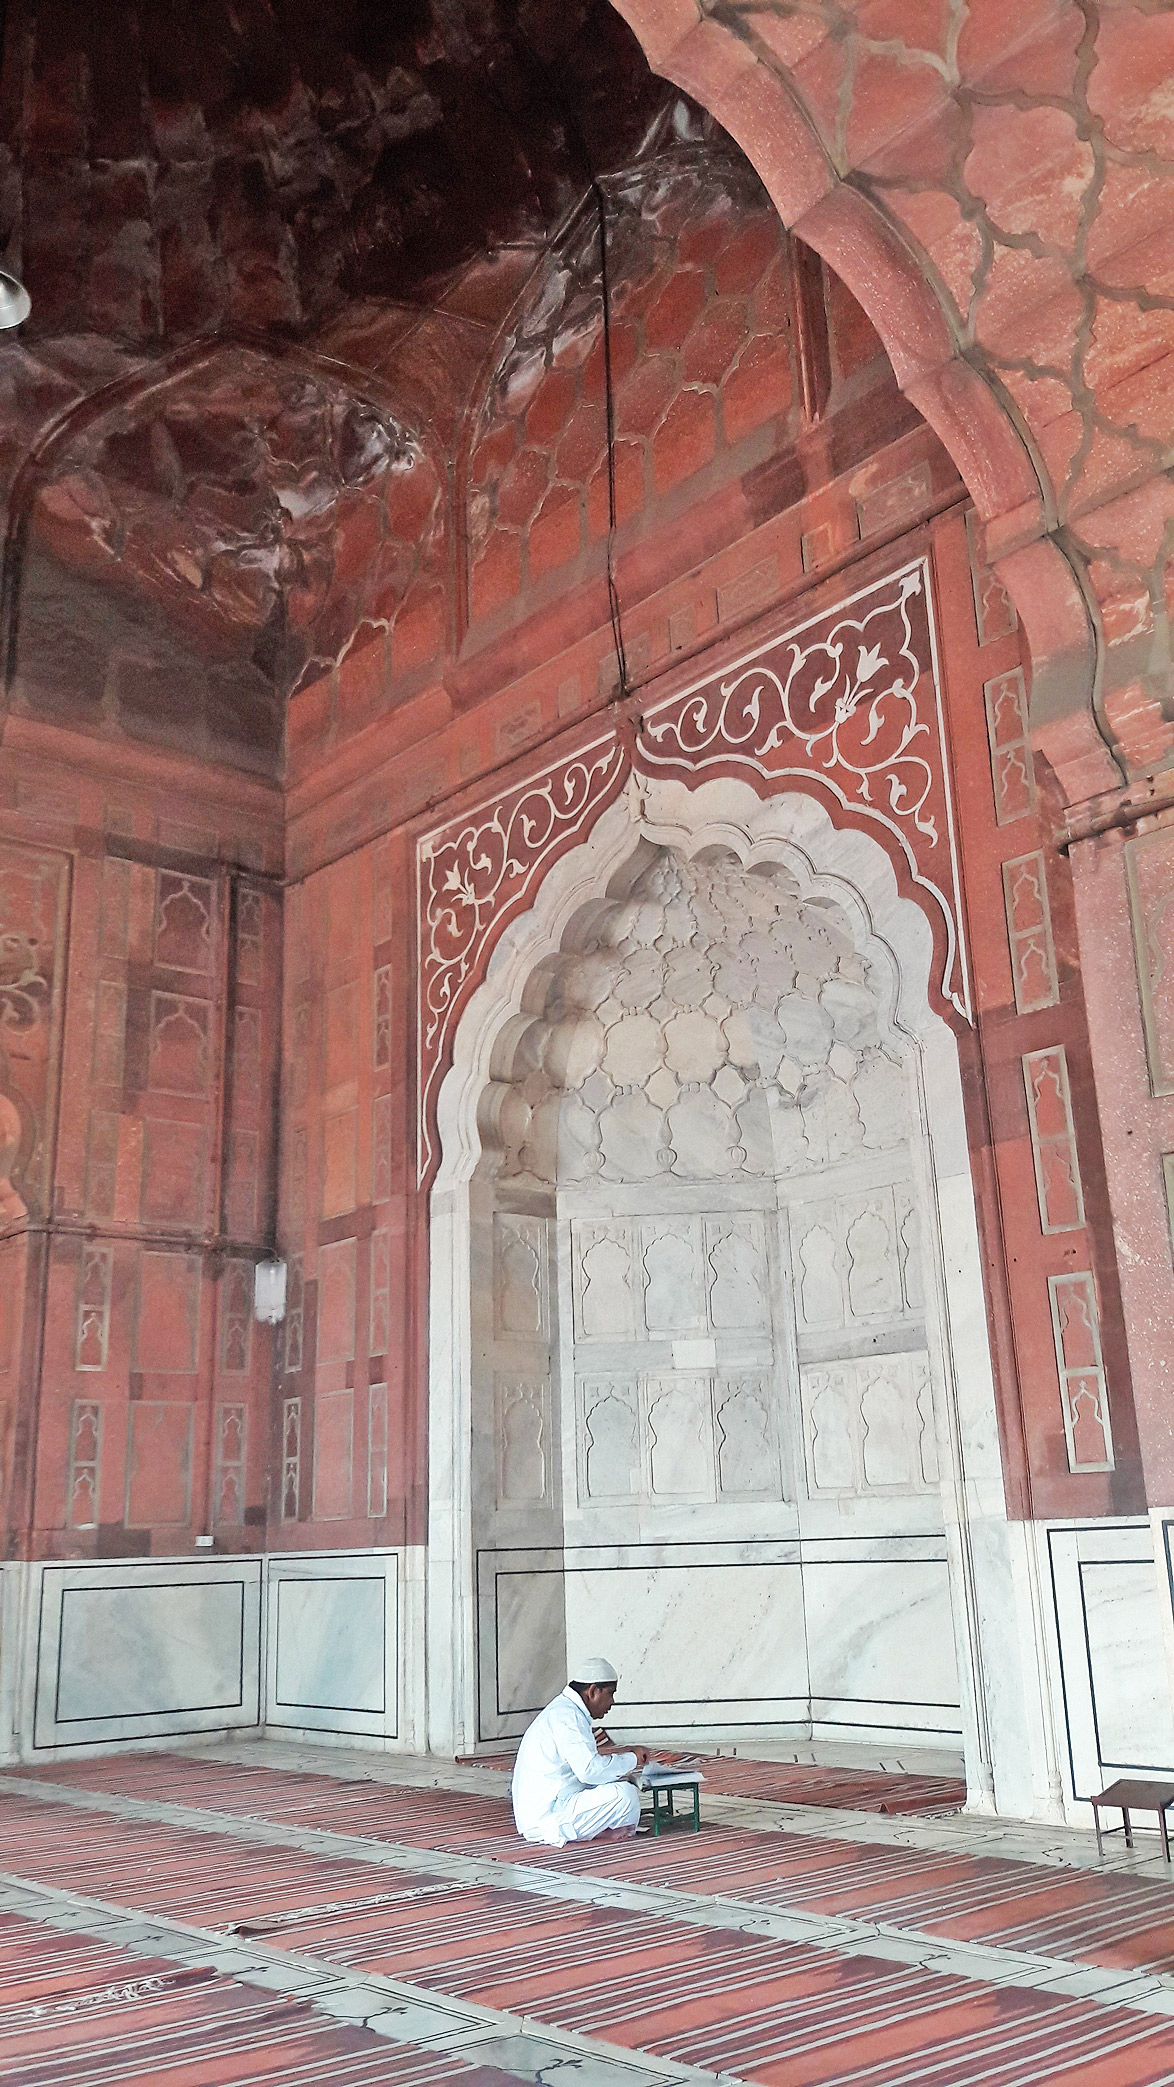 A worshipper prays, facing Mecca, at the Jama Masjid